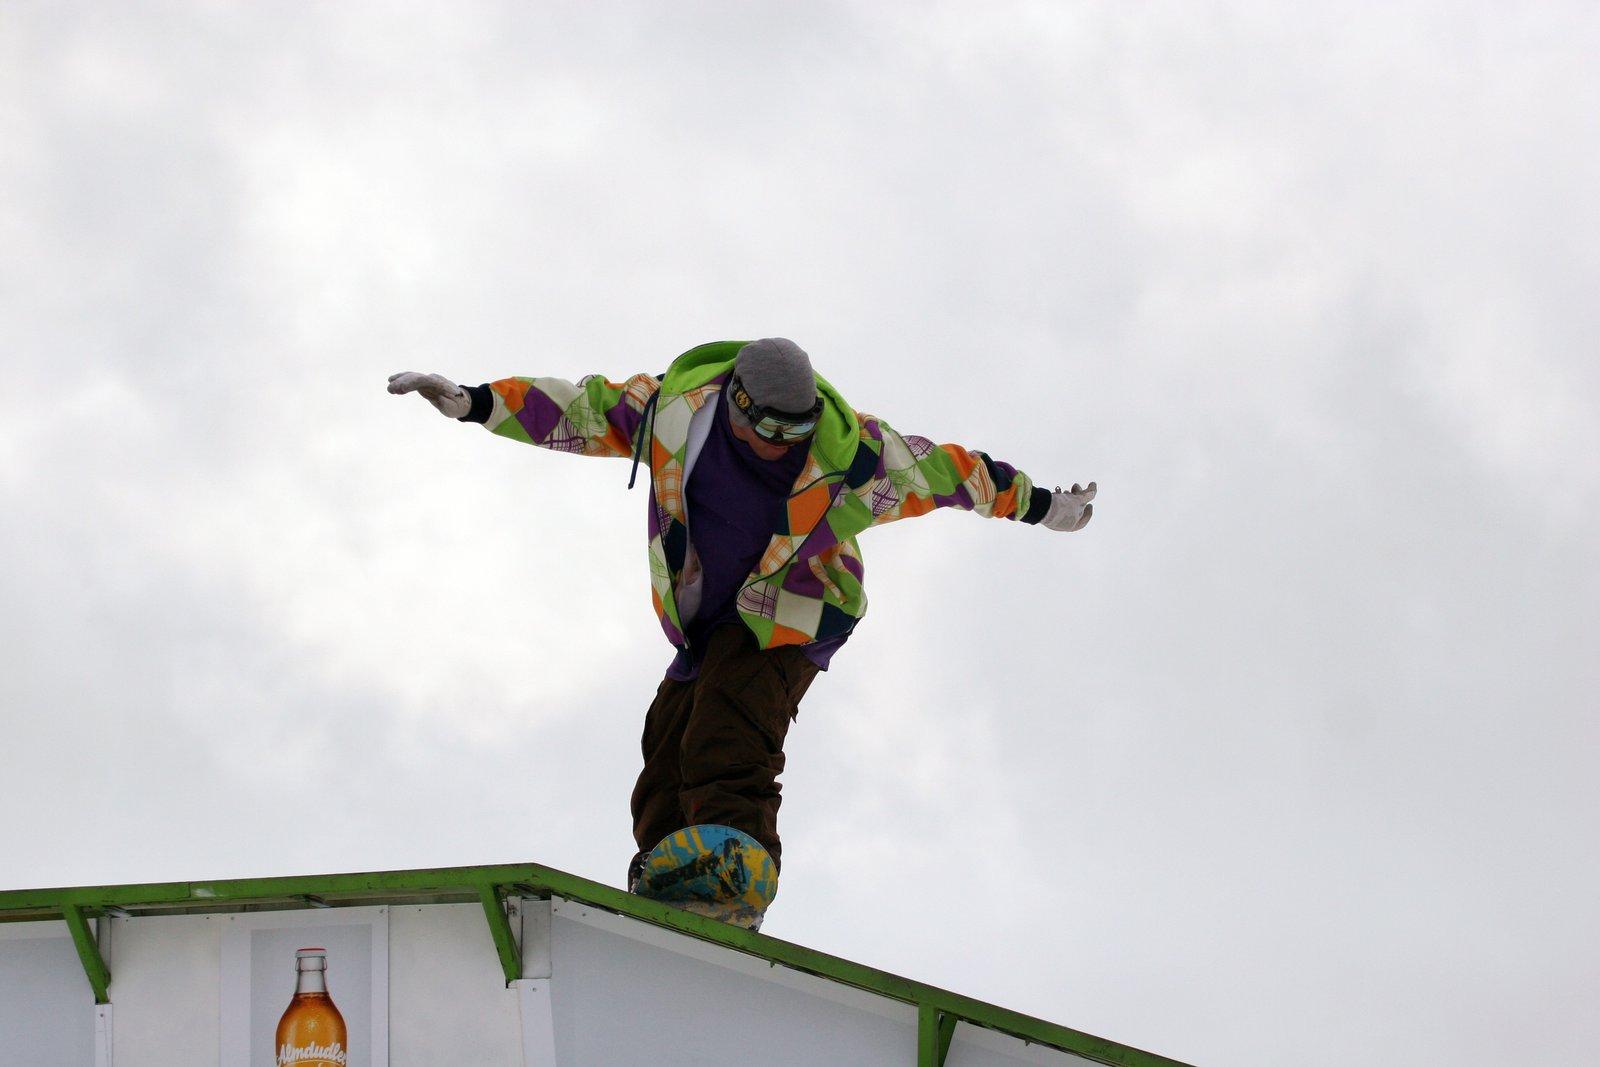 Snowboard bs kink